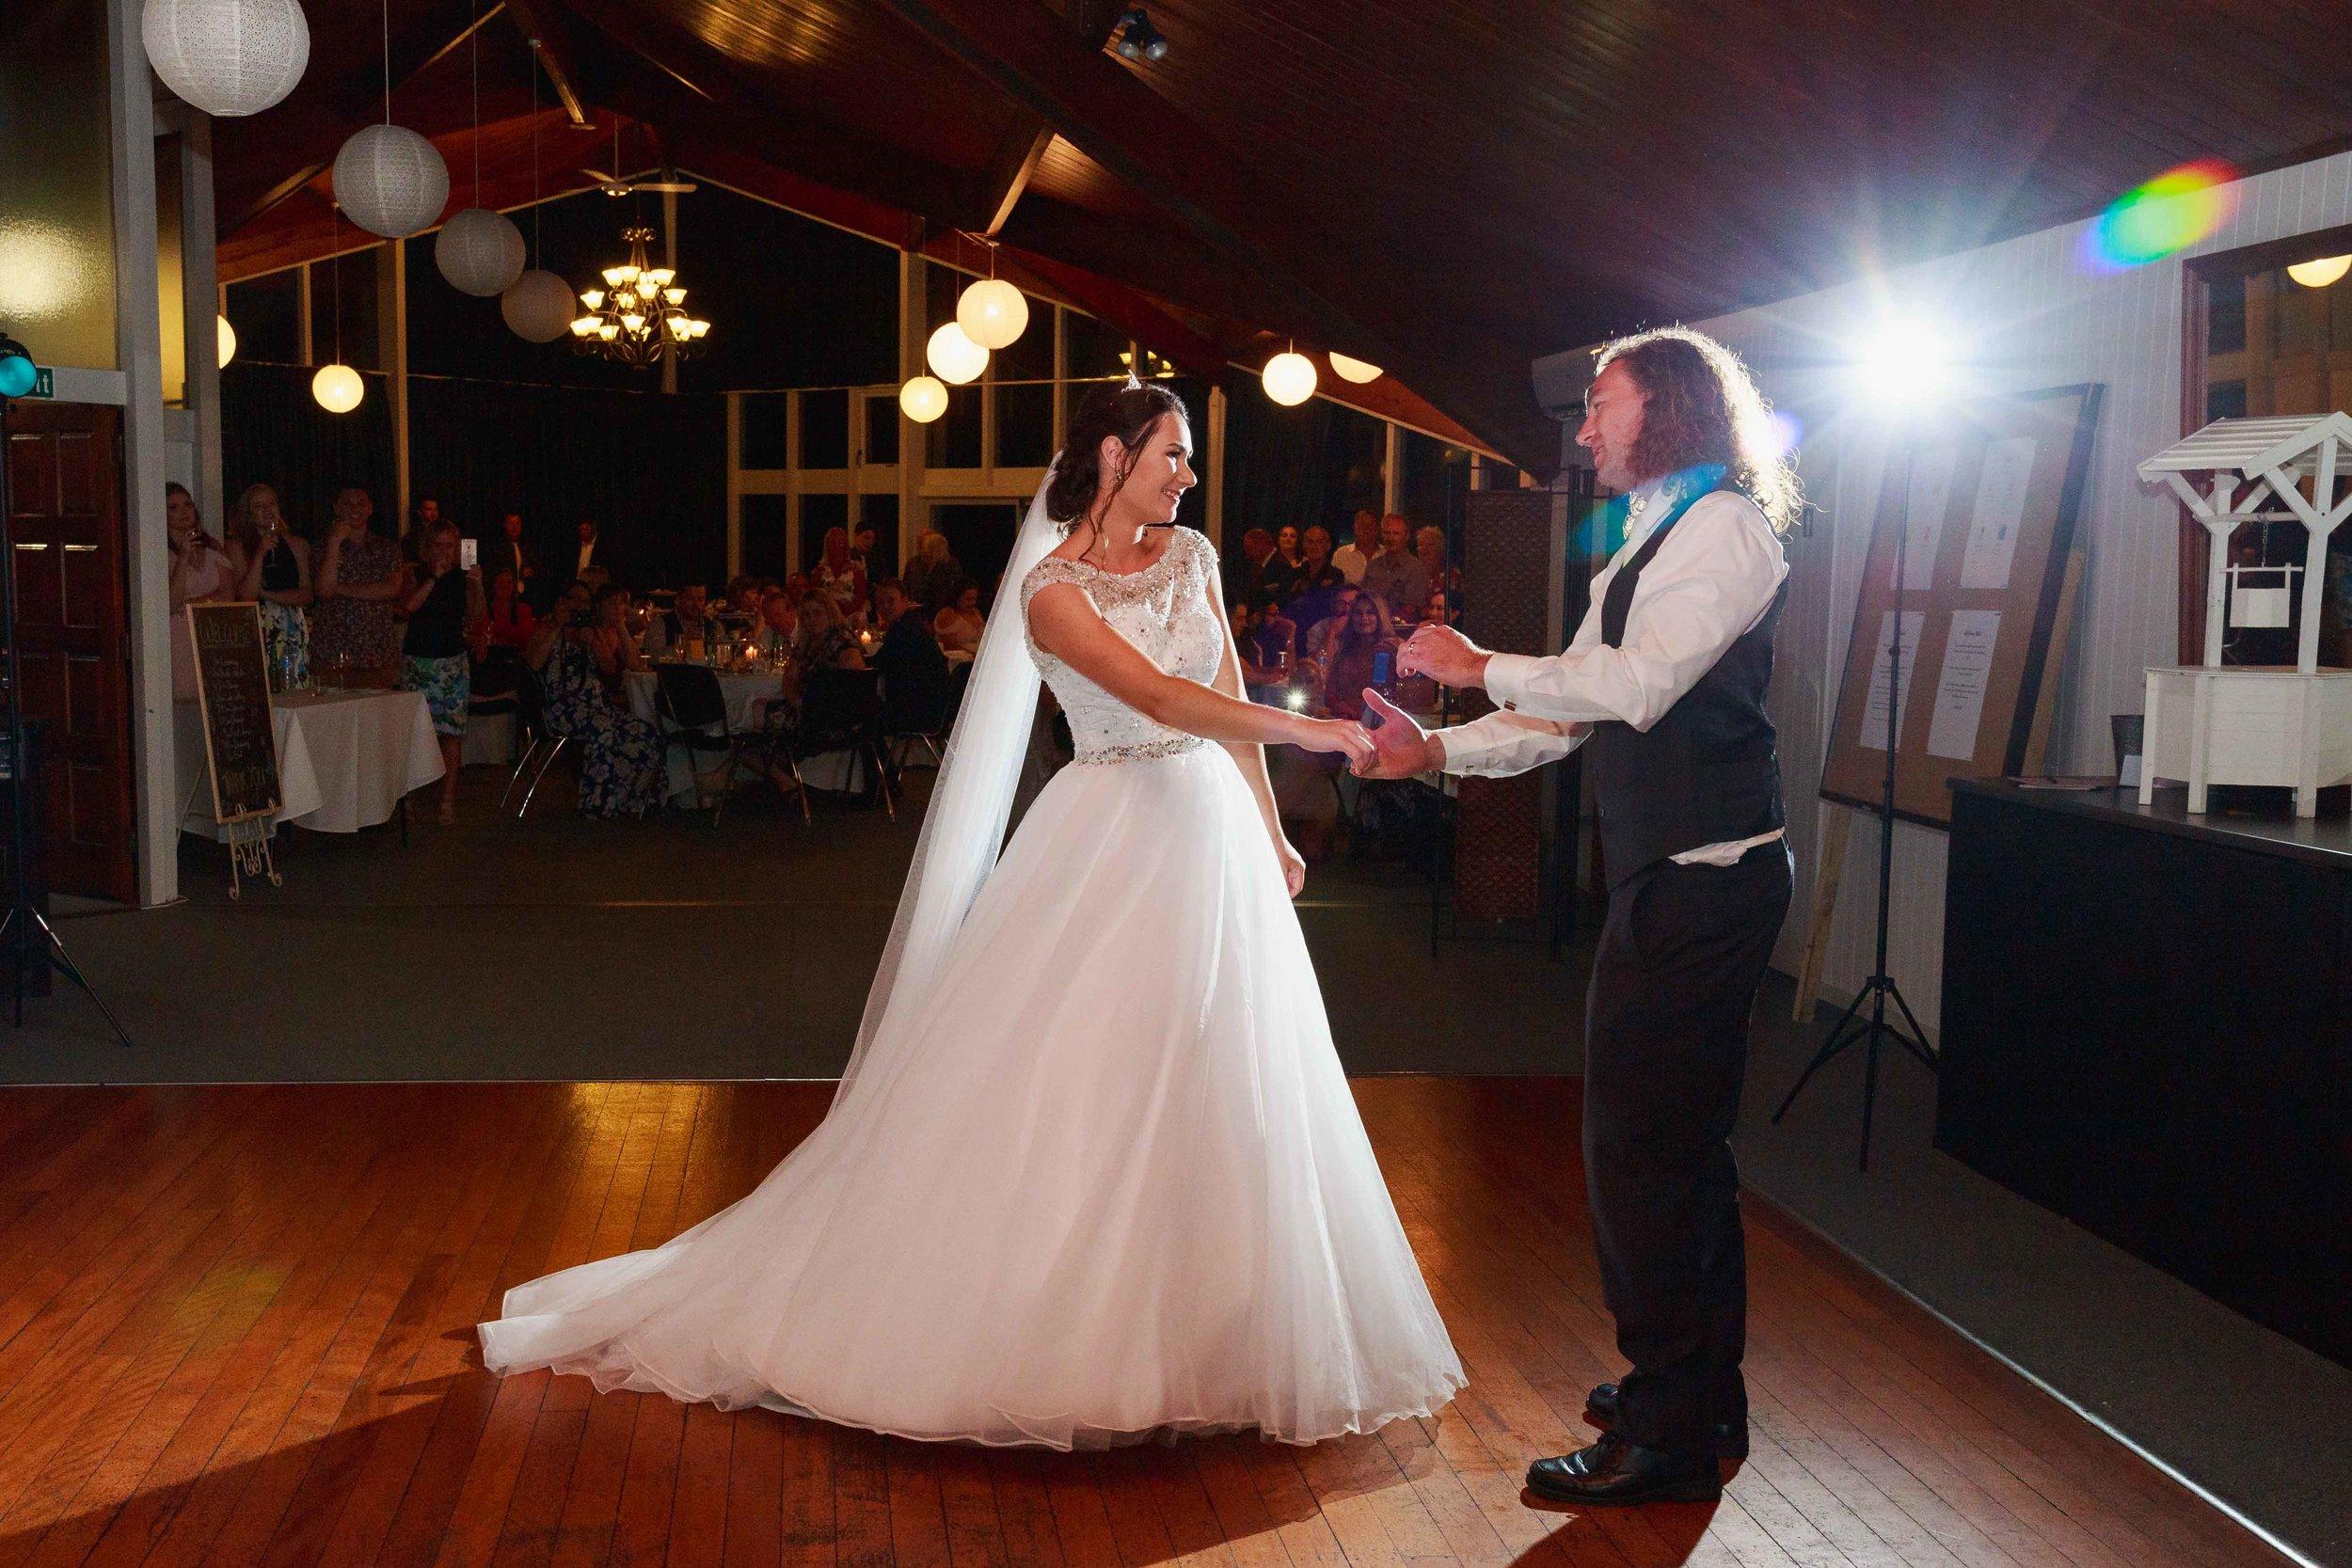 the-chalet-highlight-wedding-photography-palmerston-north-222.jpg